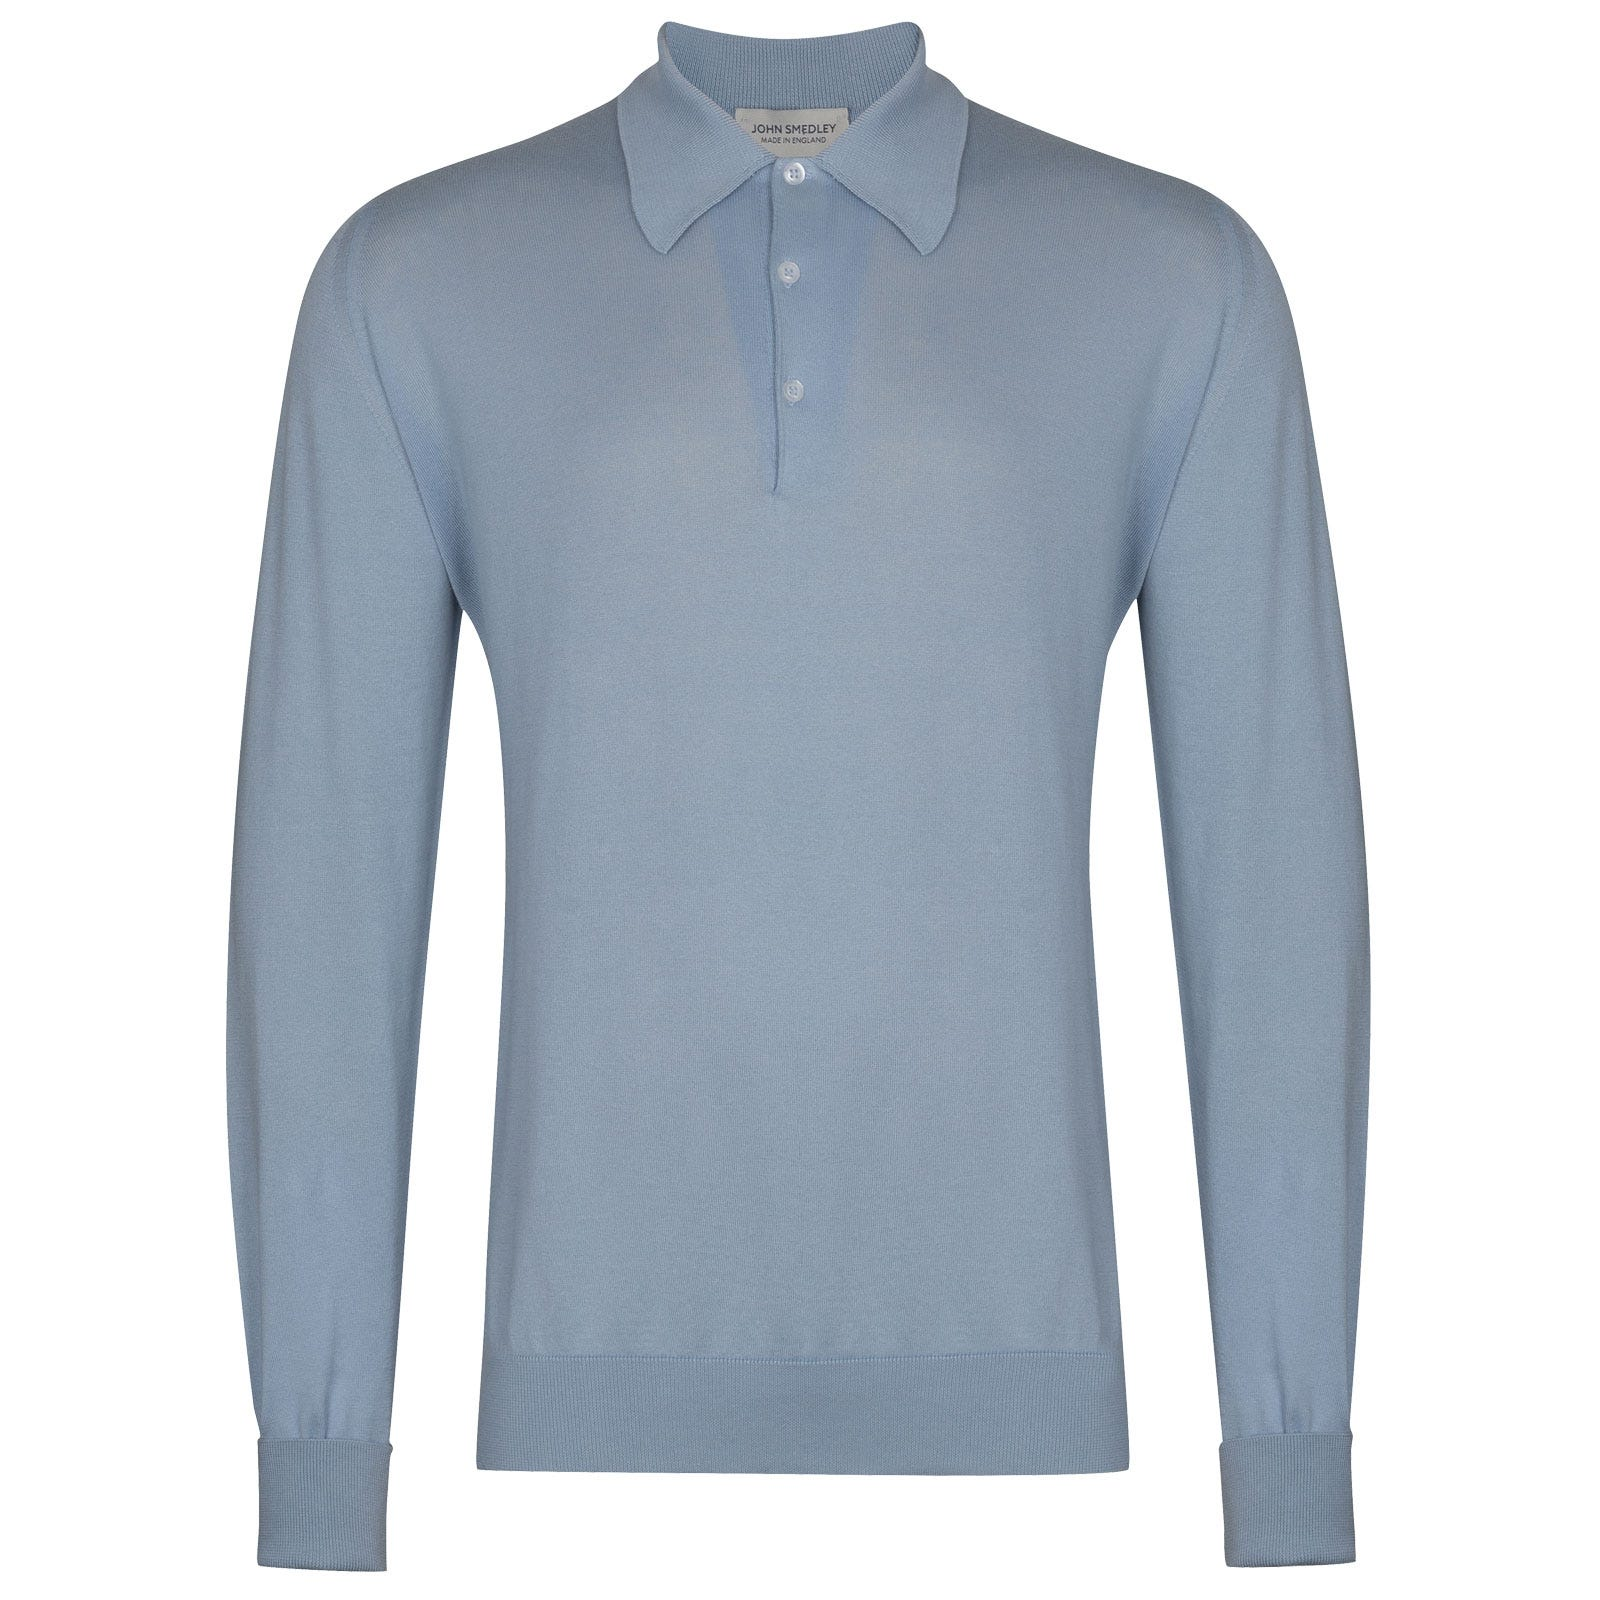 John Smedley Finchley in Dusk Blue Shirt-LGE